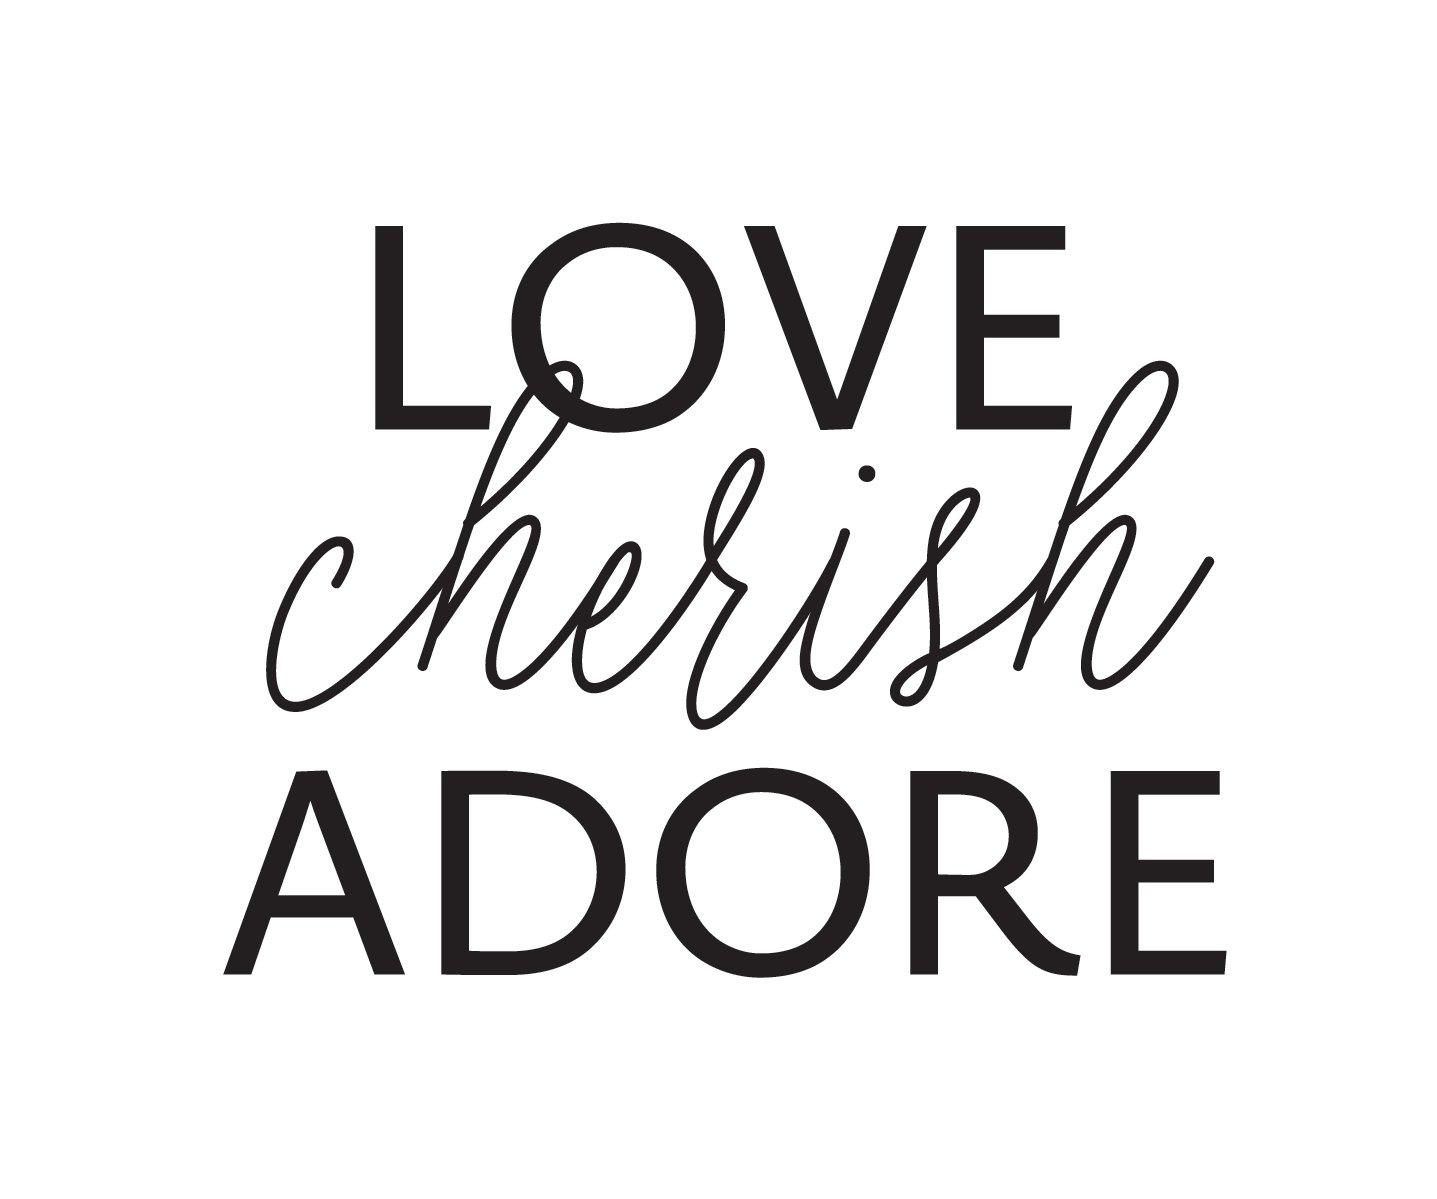 Love CherishAdore